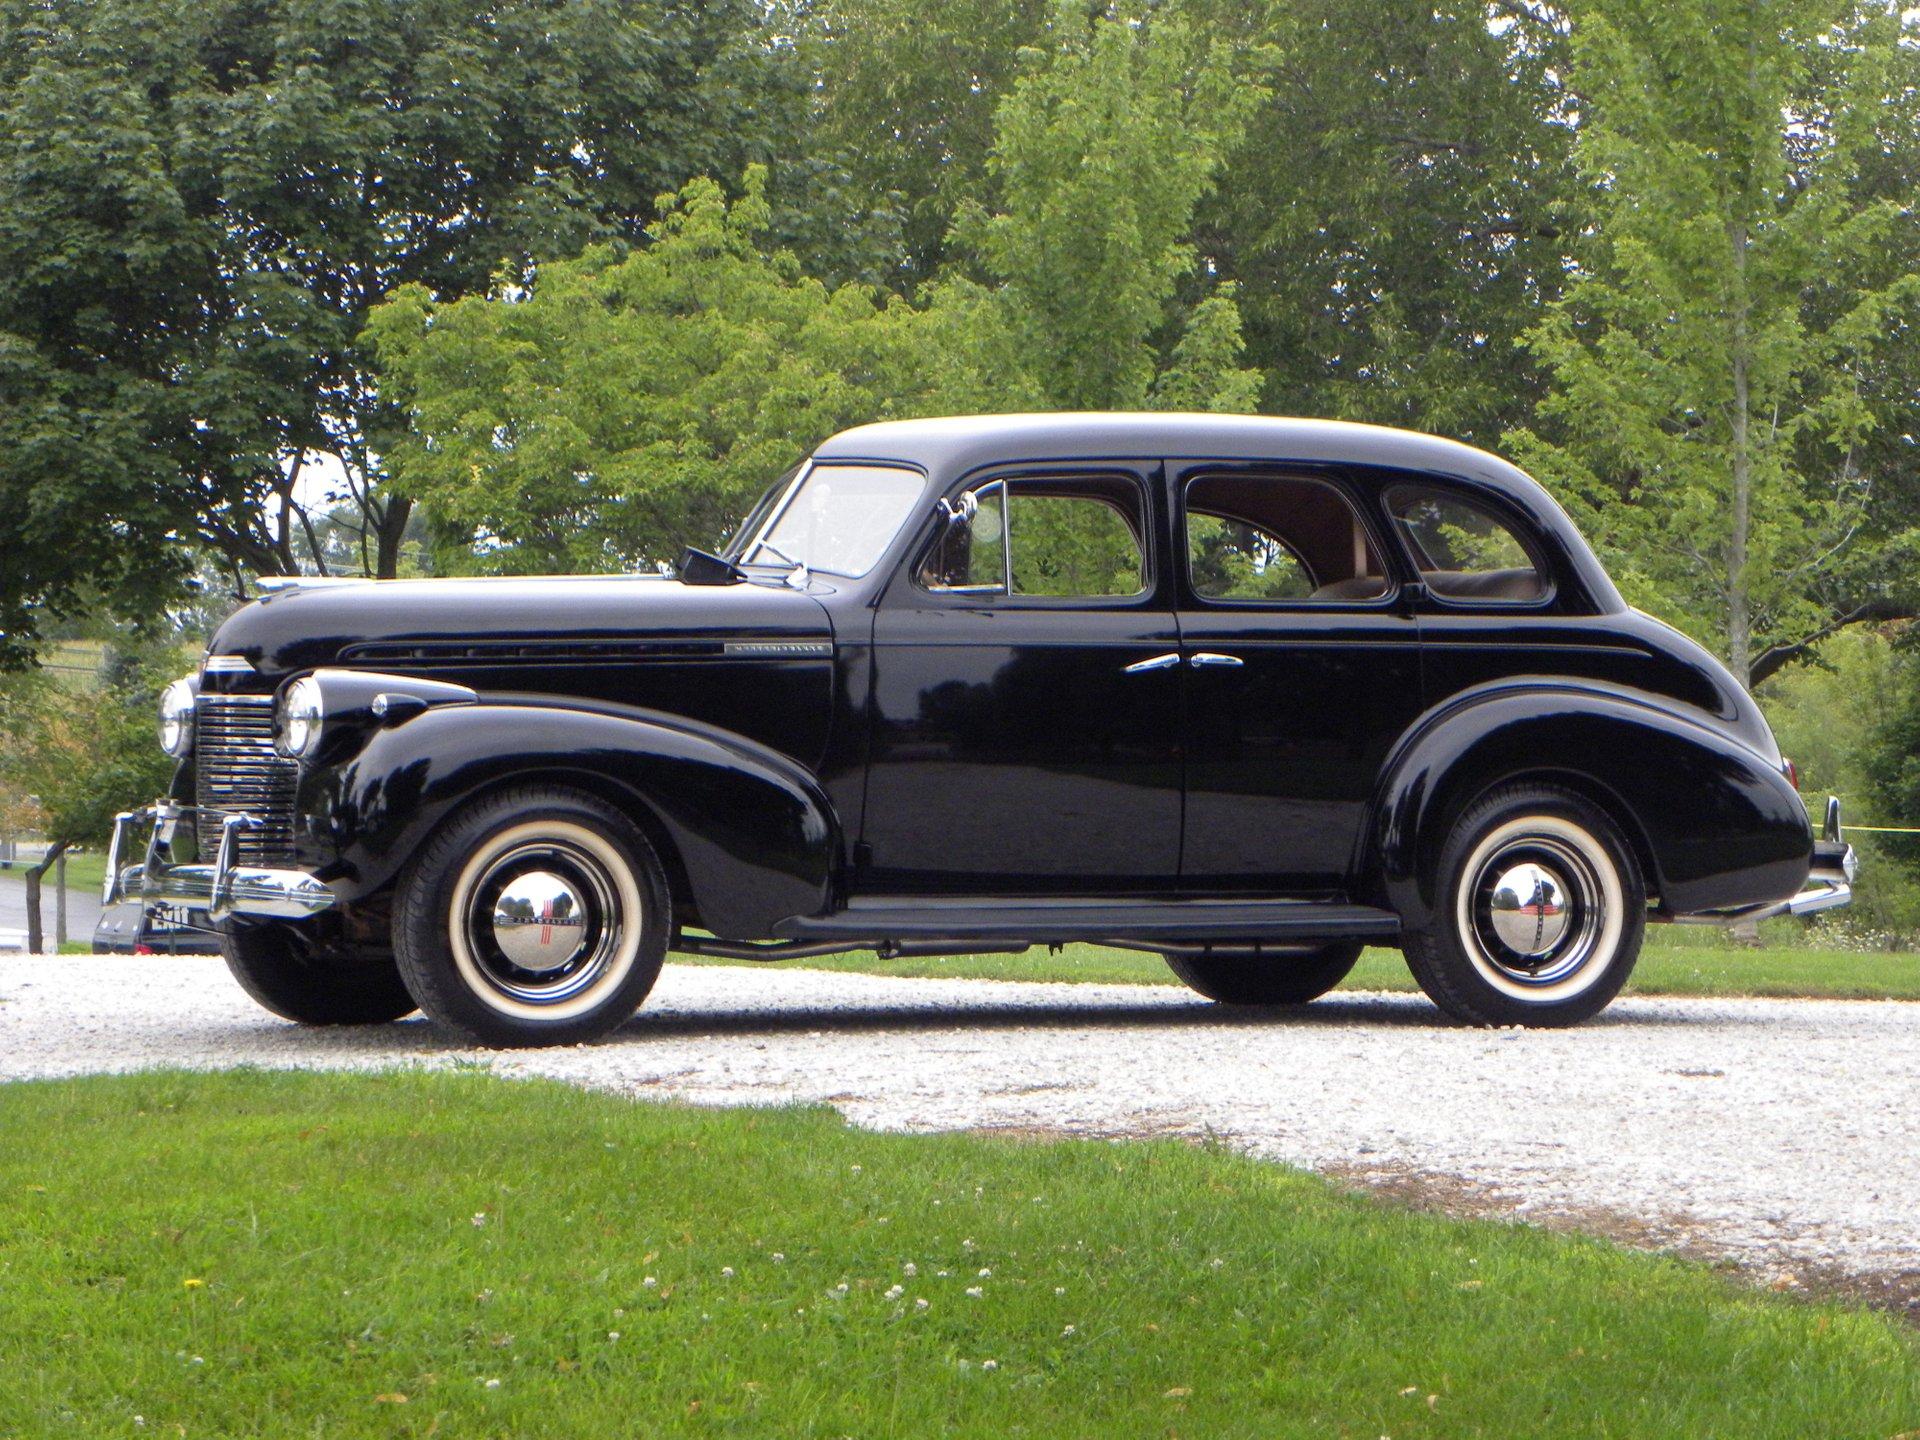 1940 Chevrolet for sale #89297 | MCG